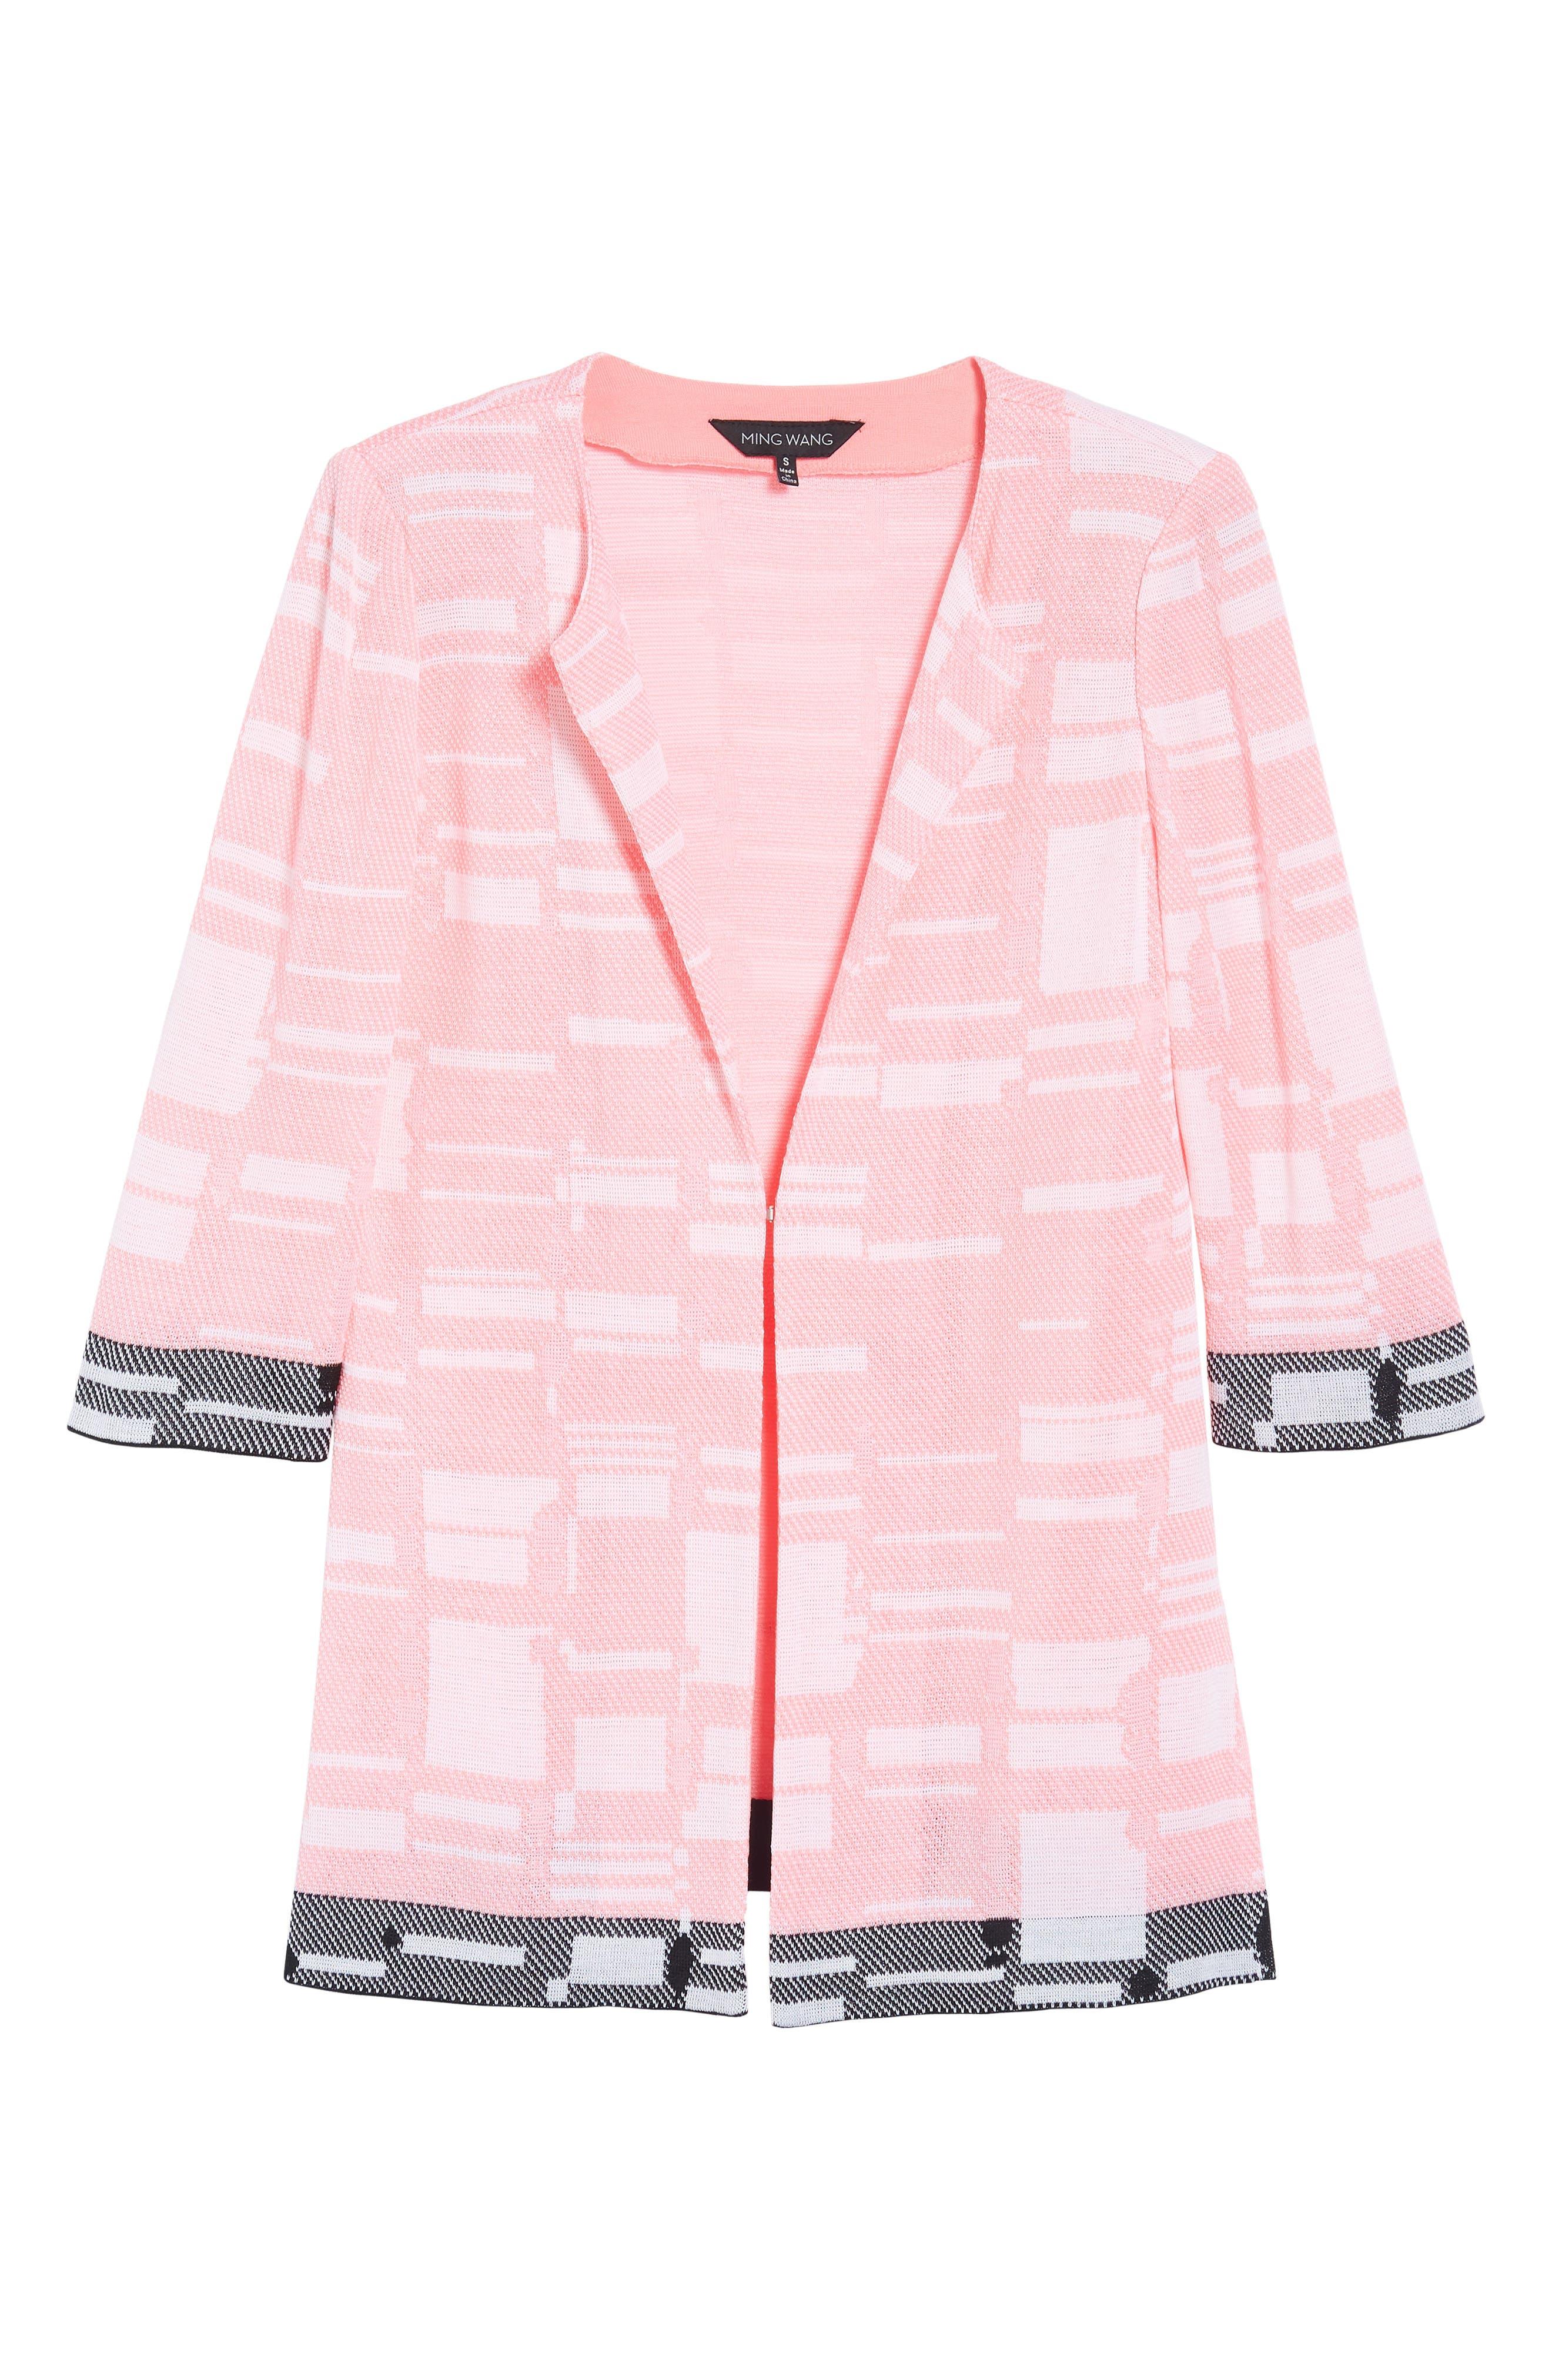 Multi Contrast Pattern Long Jacket,                             Alternate thumbnail 6, color,                             Pink Lemonade/ White/ Black